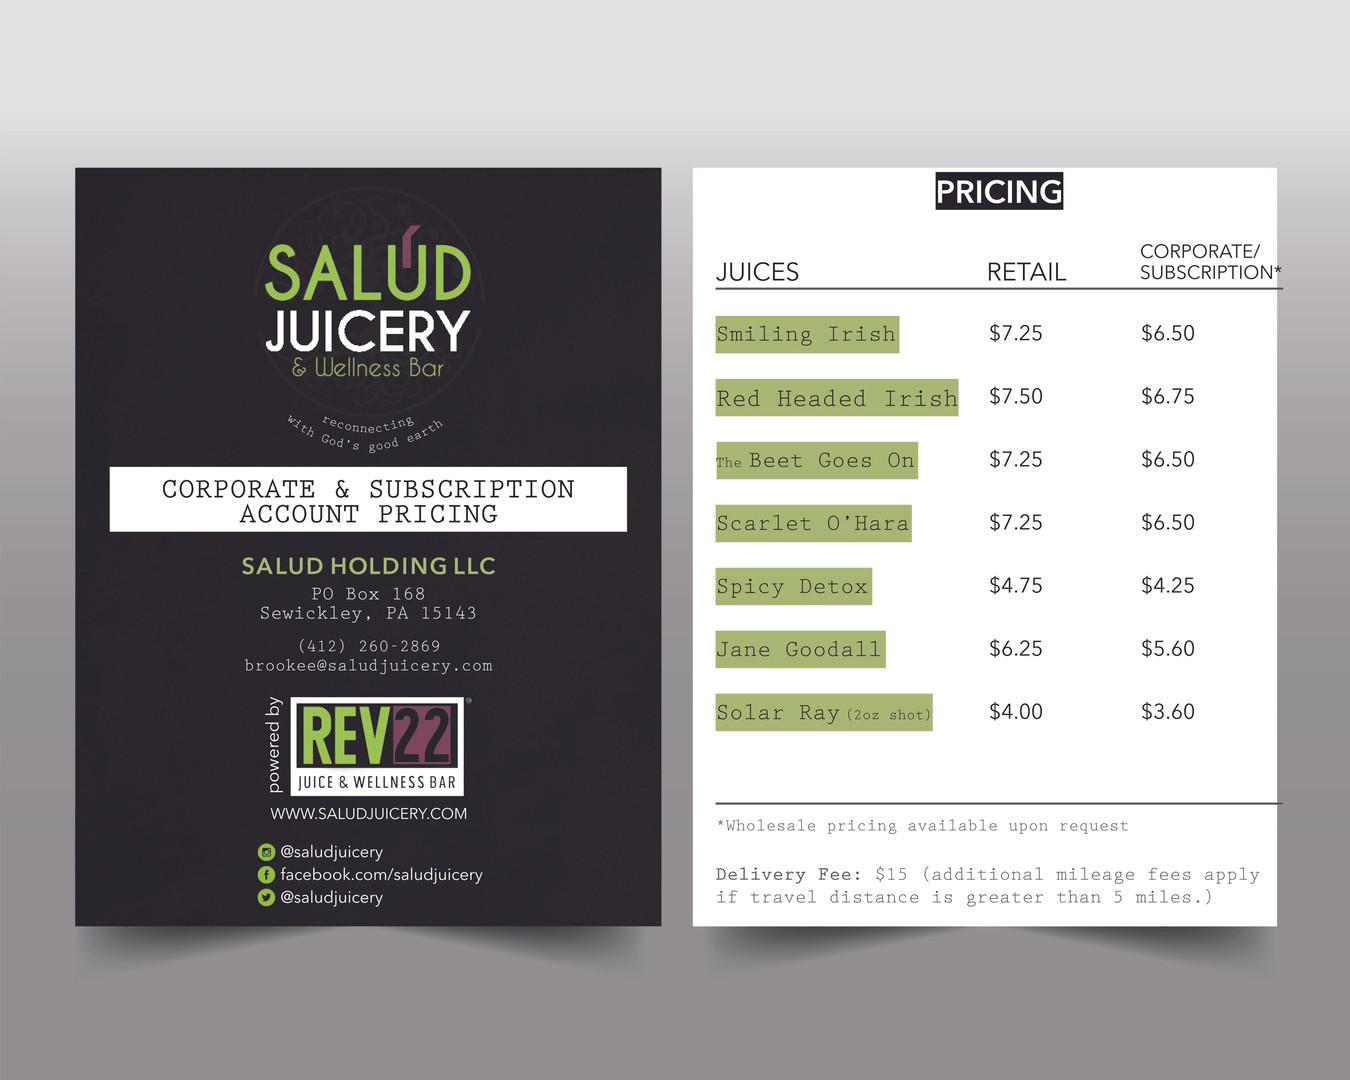 Salud Juicery pricing menu design mock-up